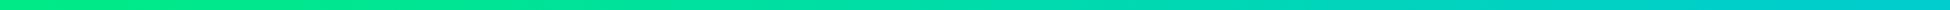 gradient_line.png